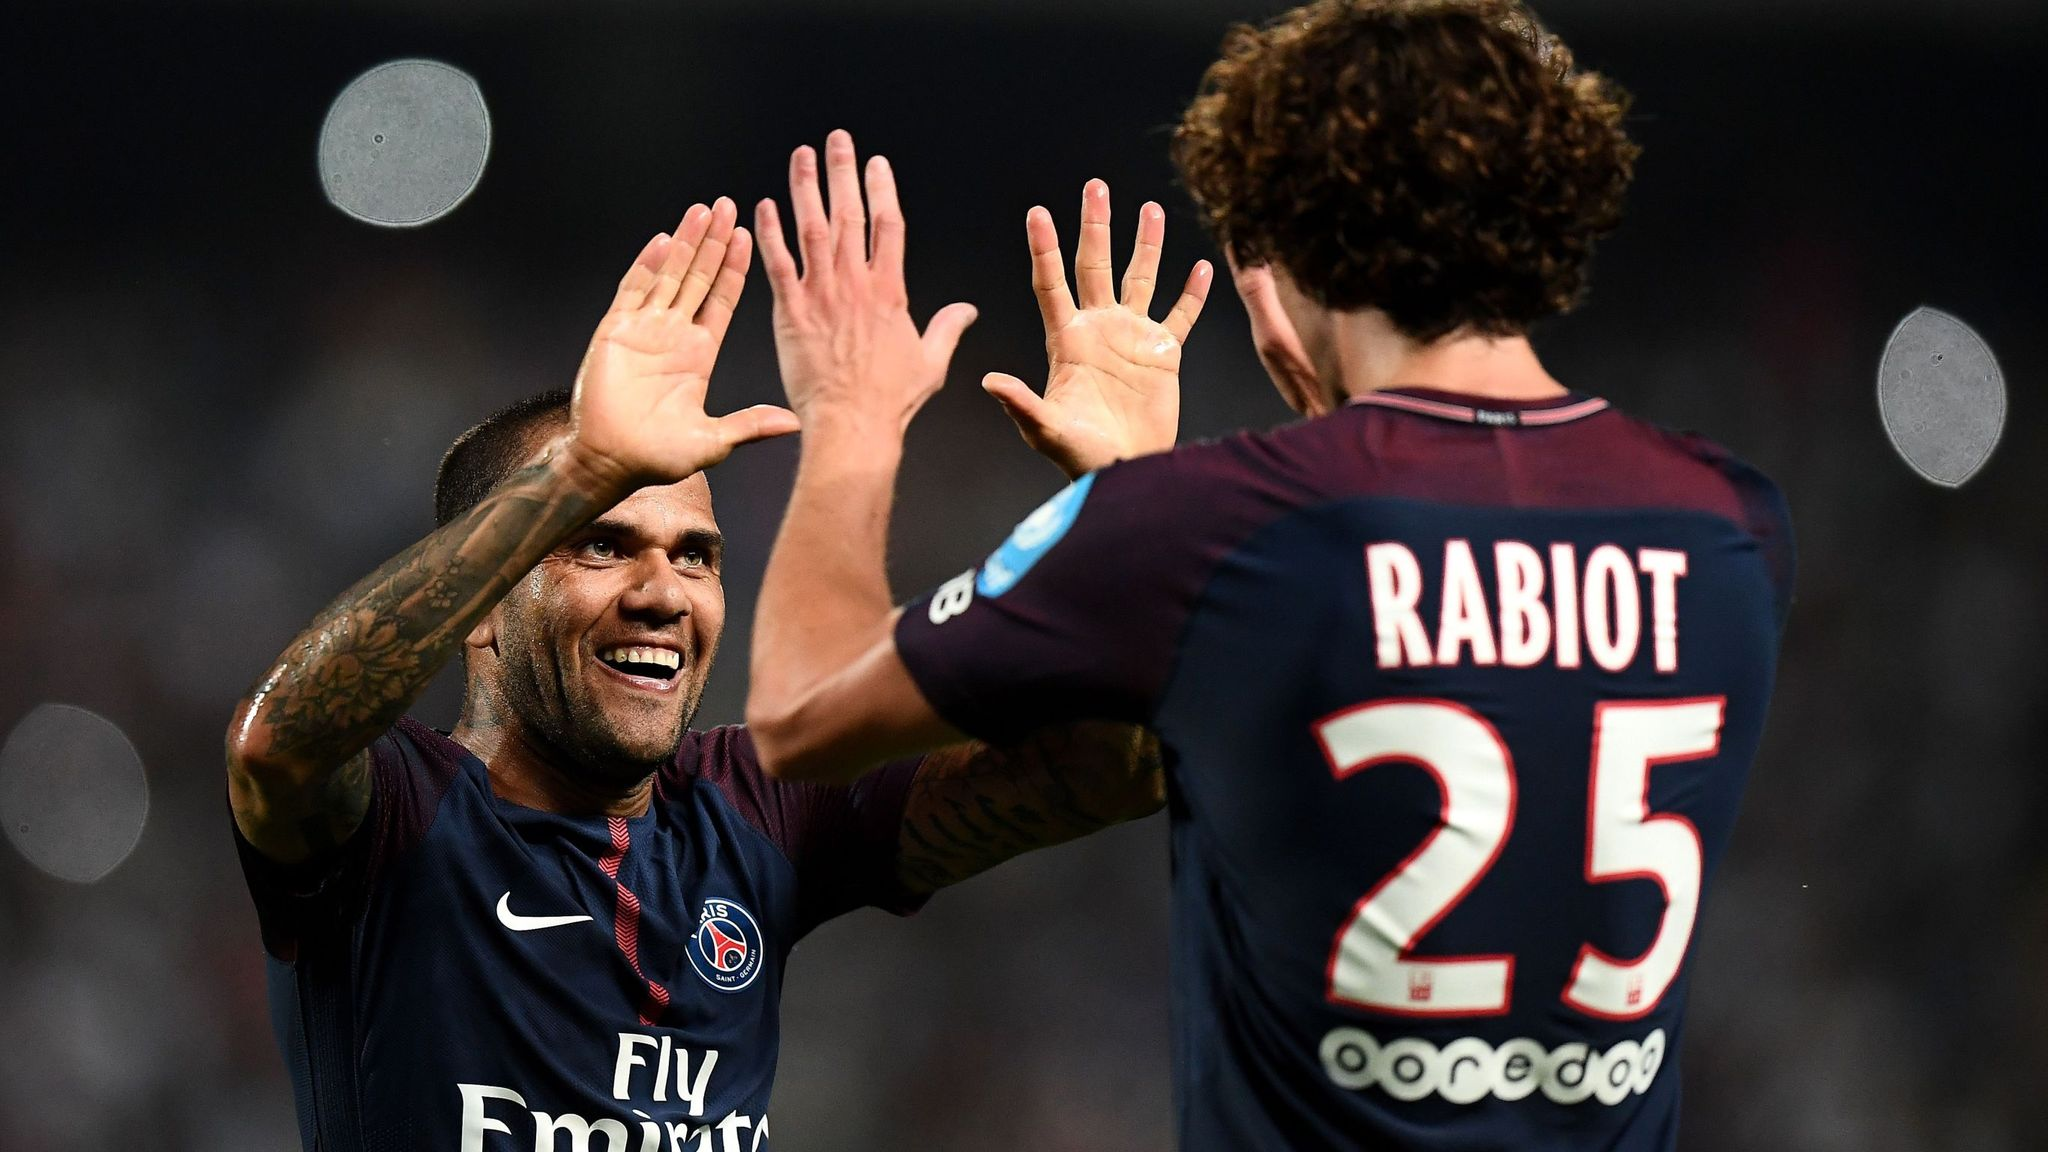 Monaco 1 - 2 PSG - Match Report & Highlights